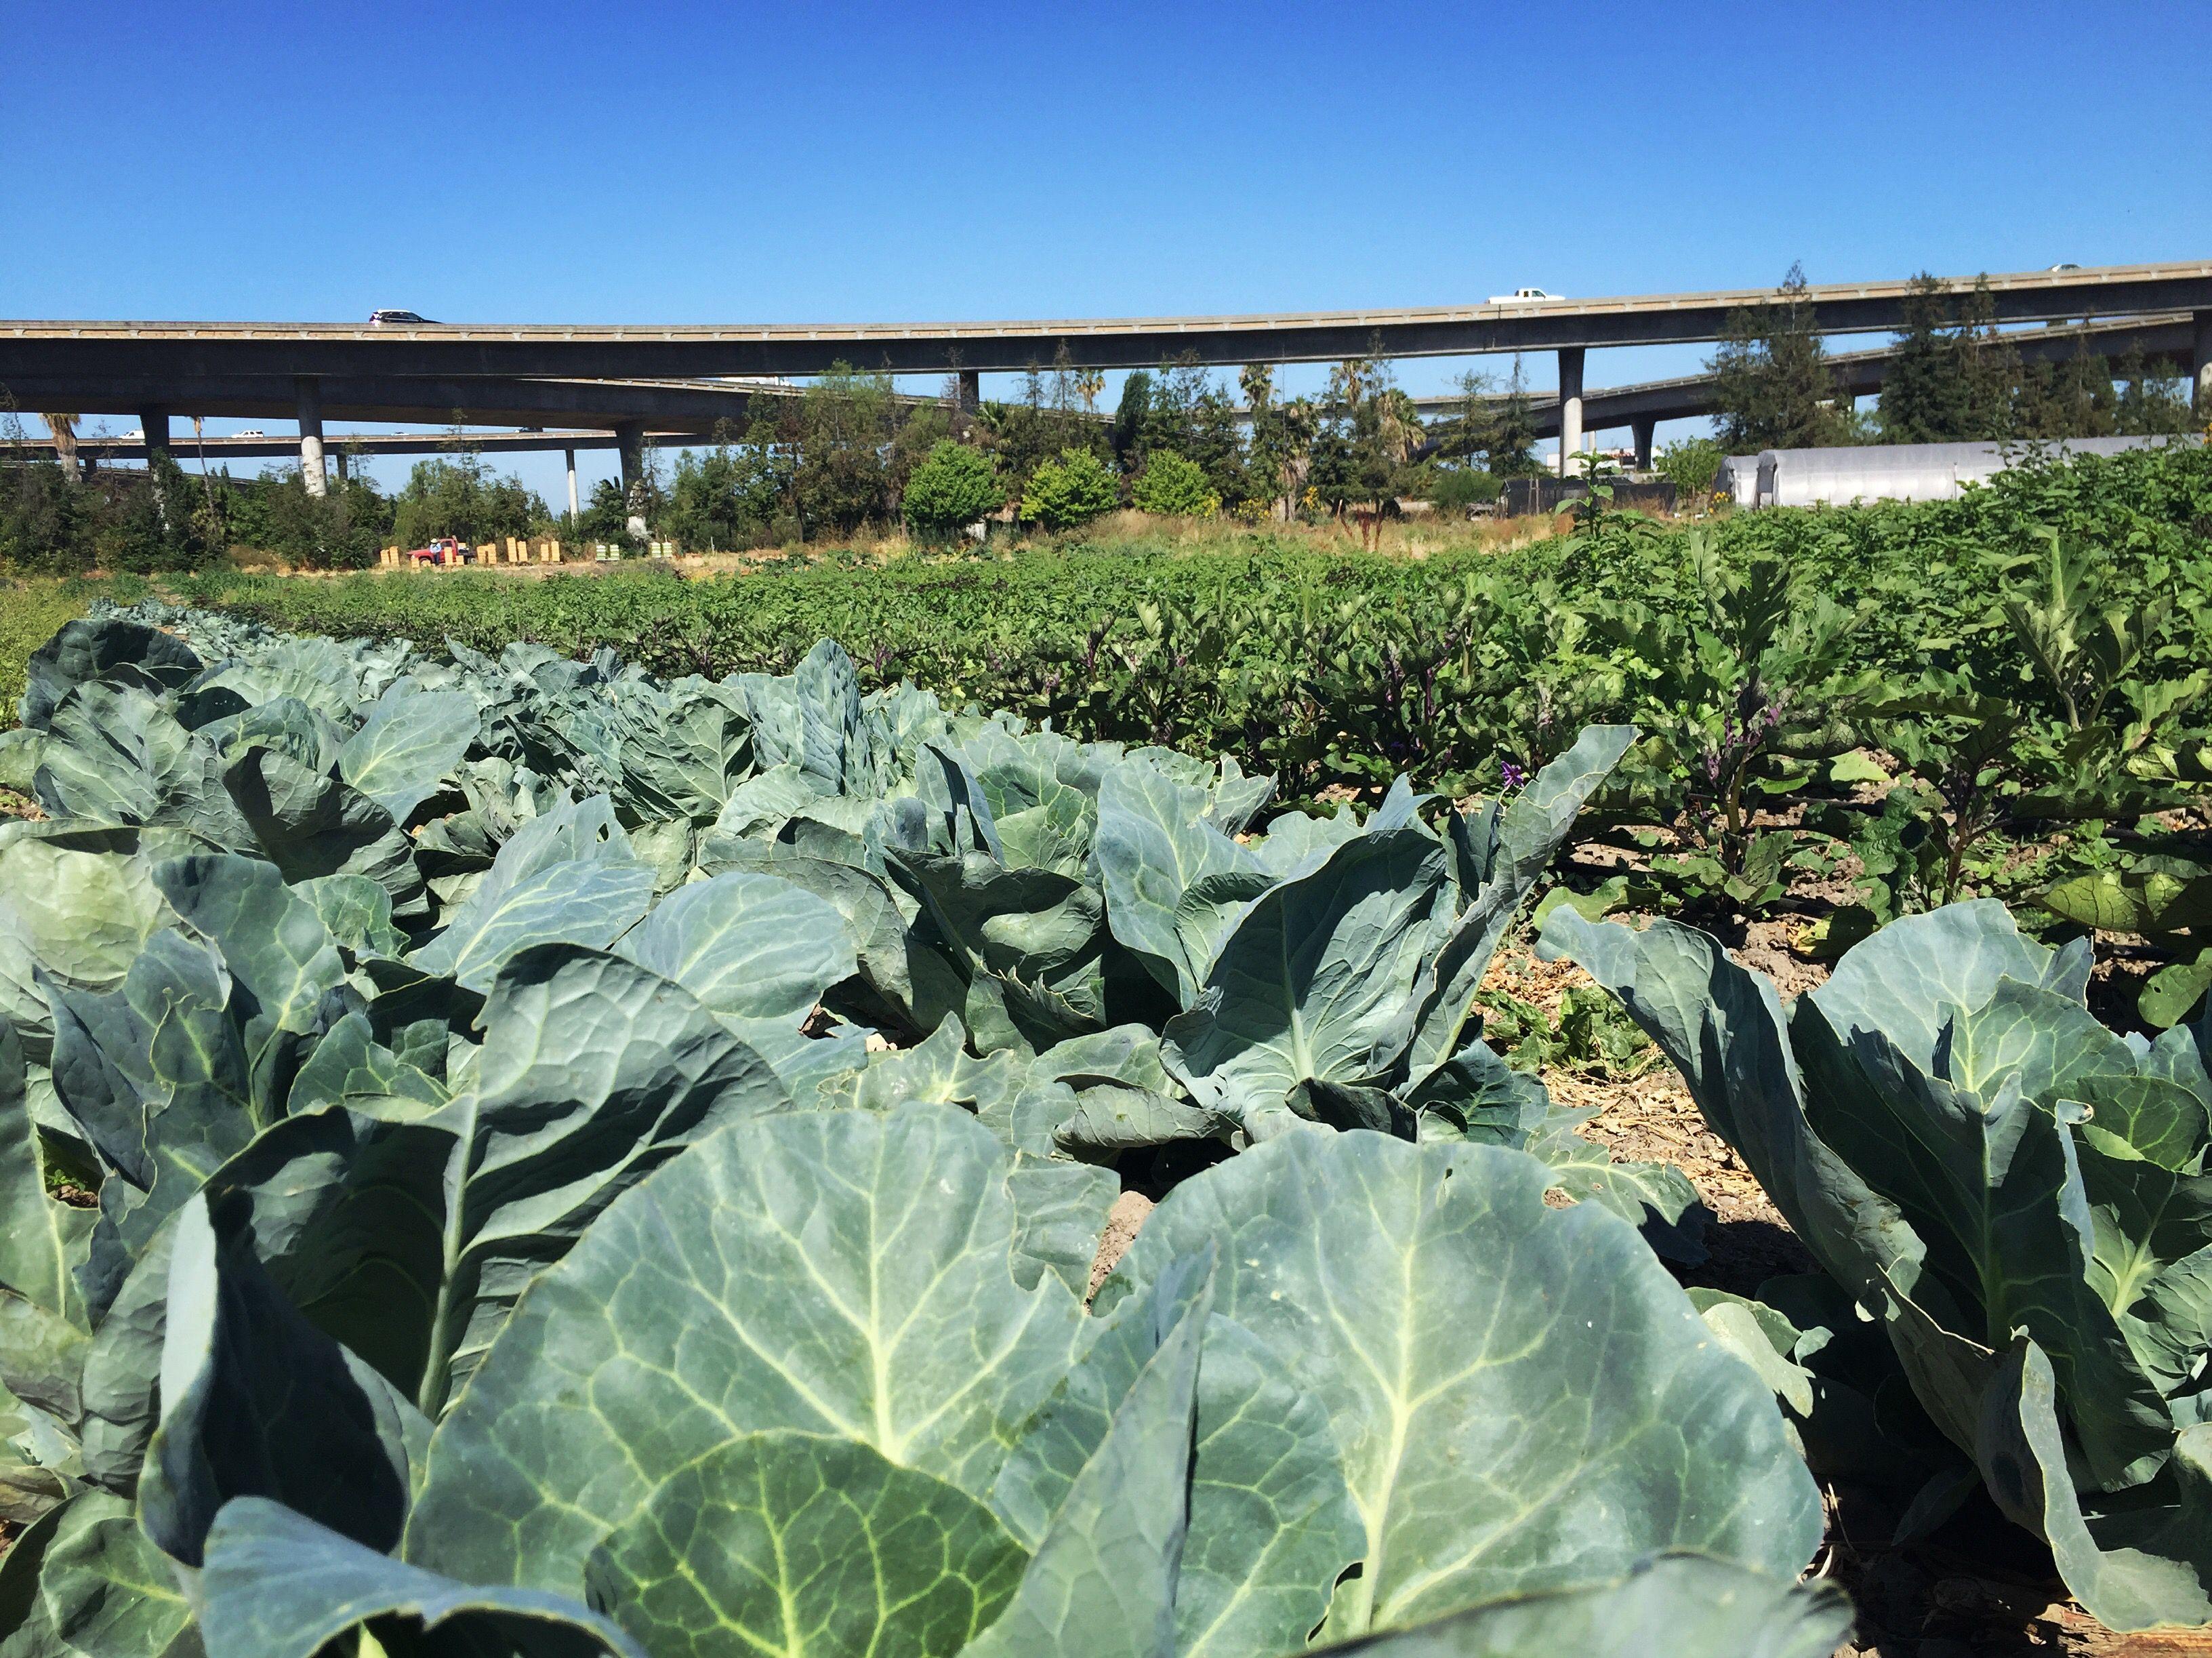 craigslist san francisco bay area farm and garden